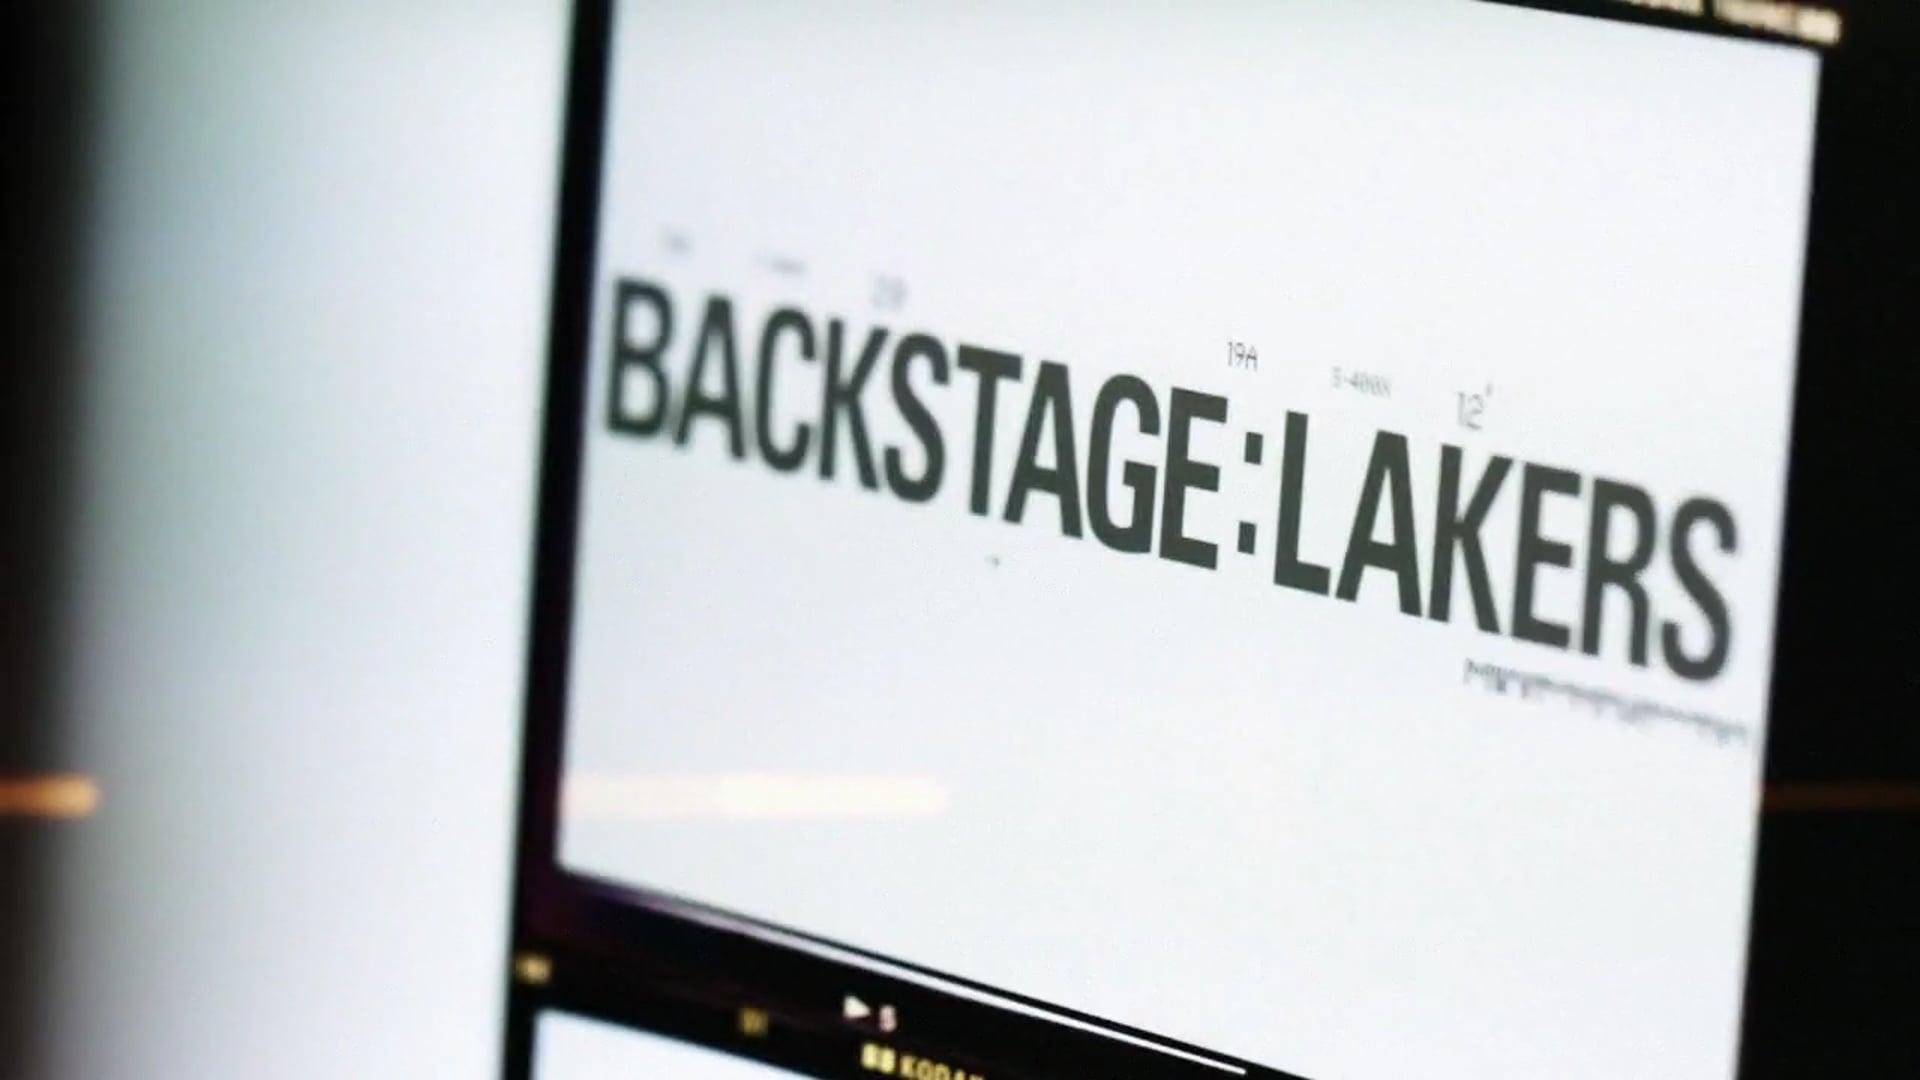 Spectrum SportsNet Backstage: Lakers